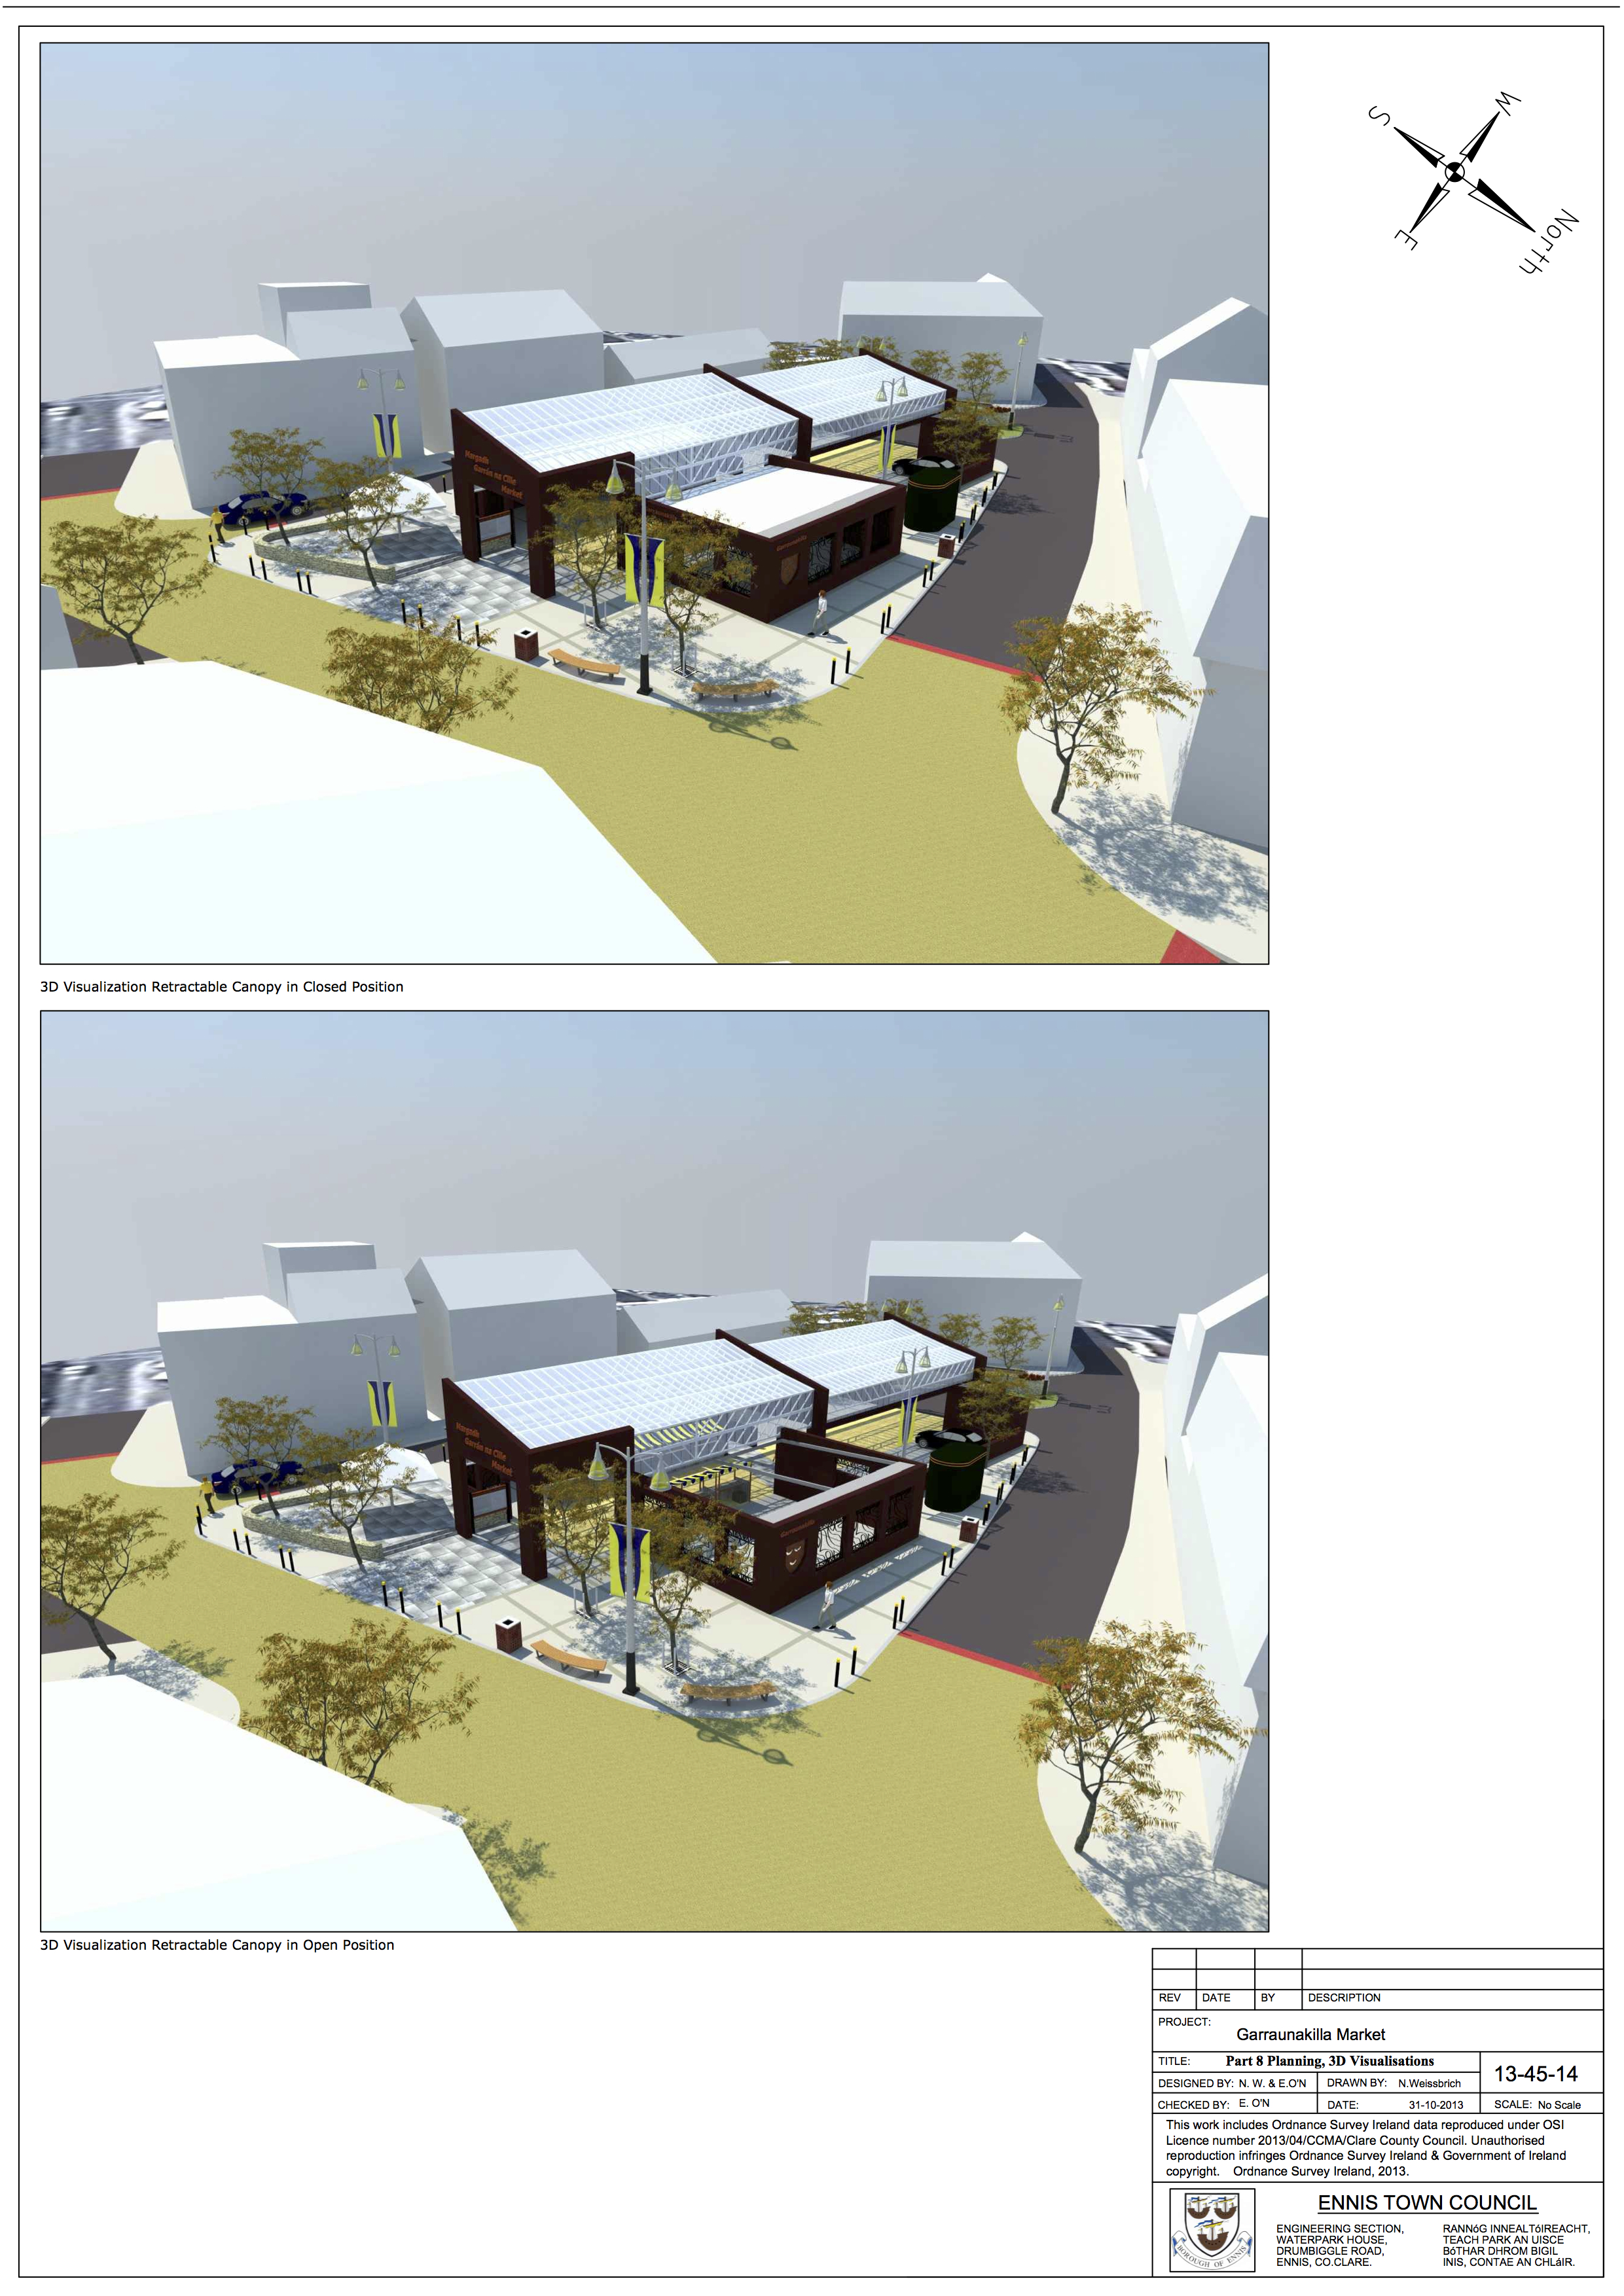 garraunakilla-market-area-redevelopment-3d-visualisations-19097.jpeg